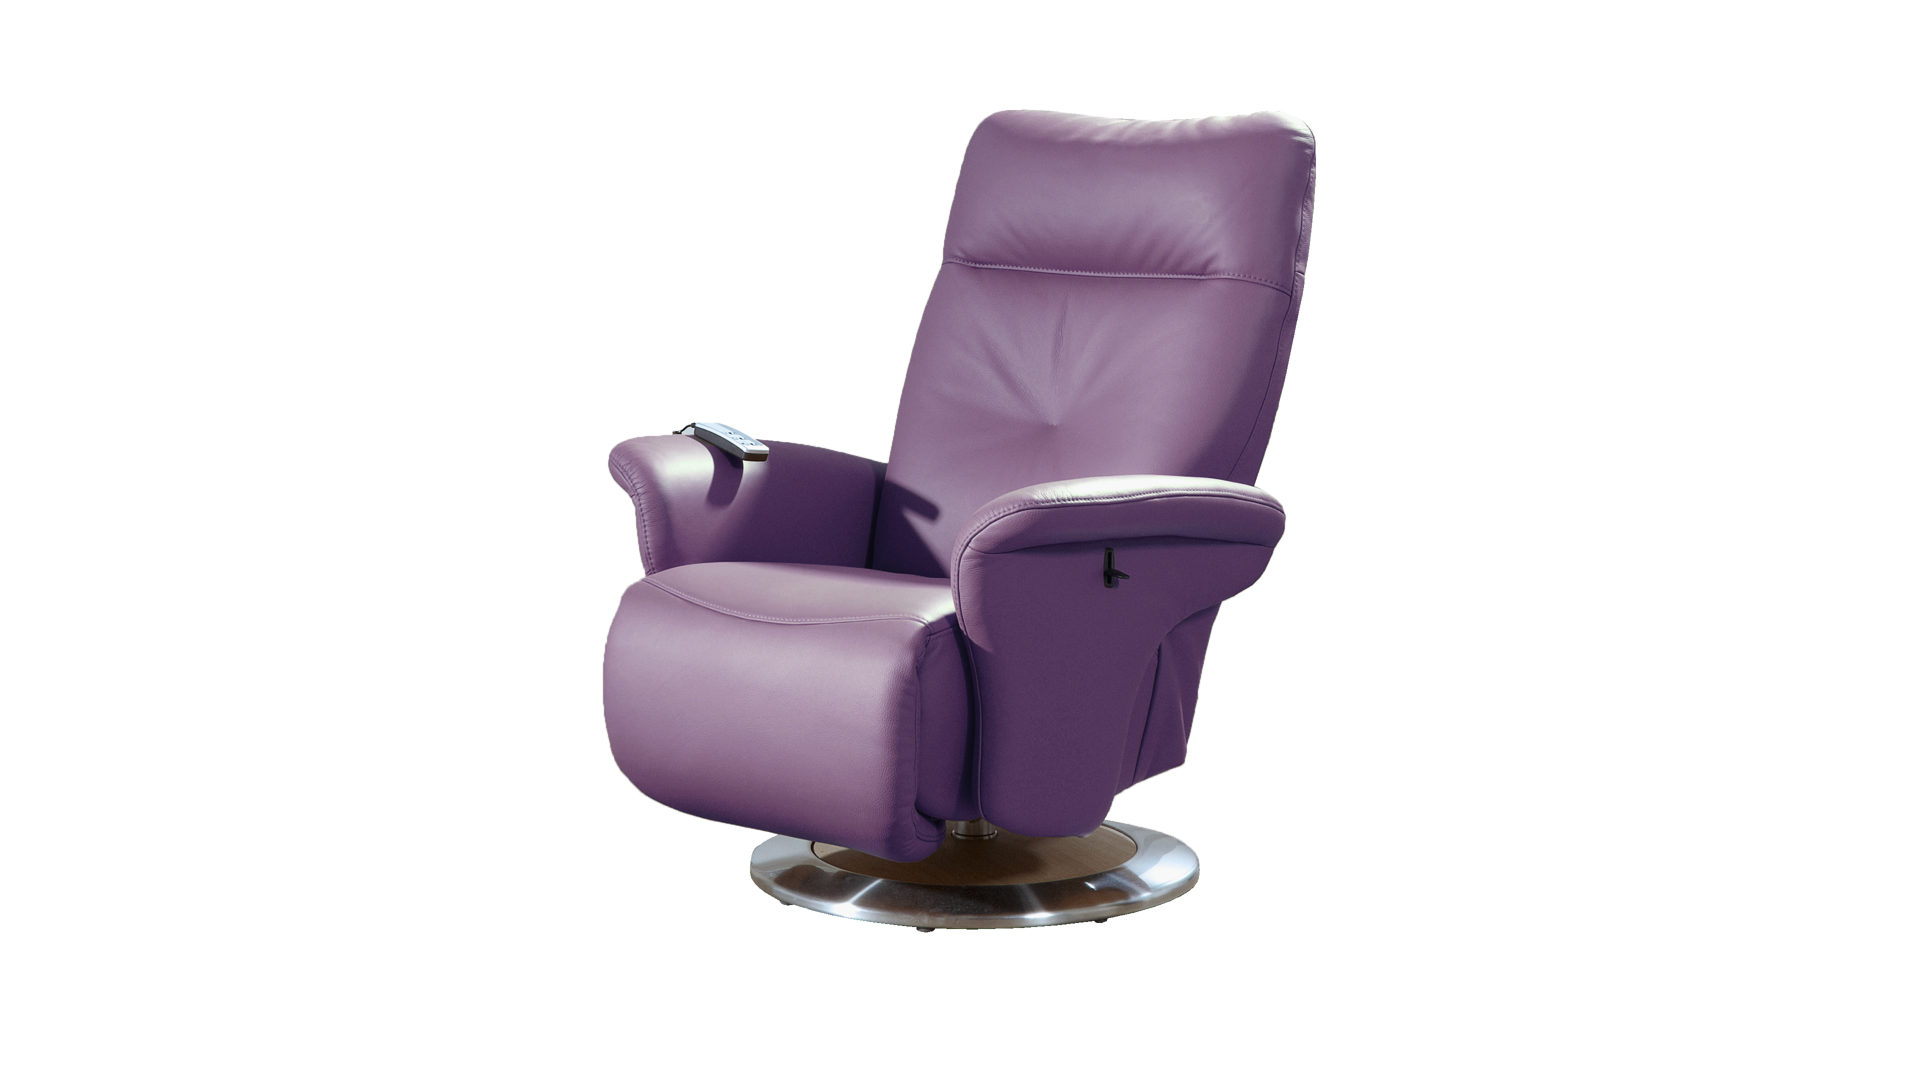 Himolla Cosyform Sessel Relaxsessel Mit Hocker Als Polstermöbel